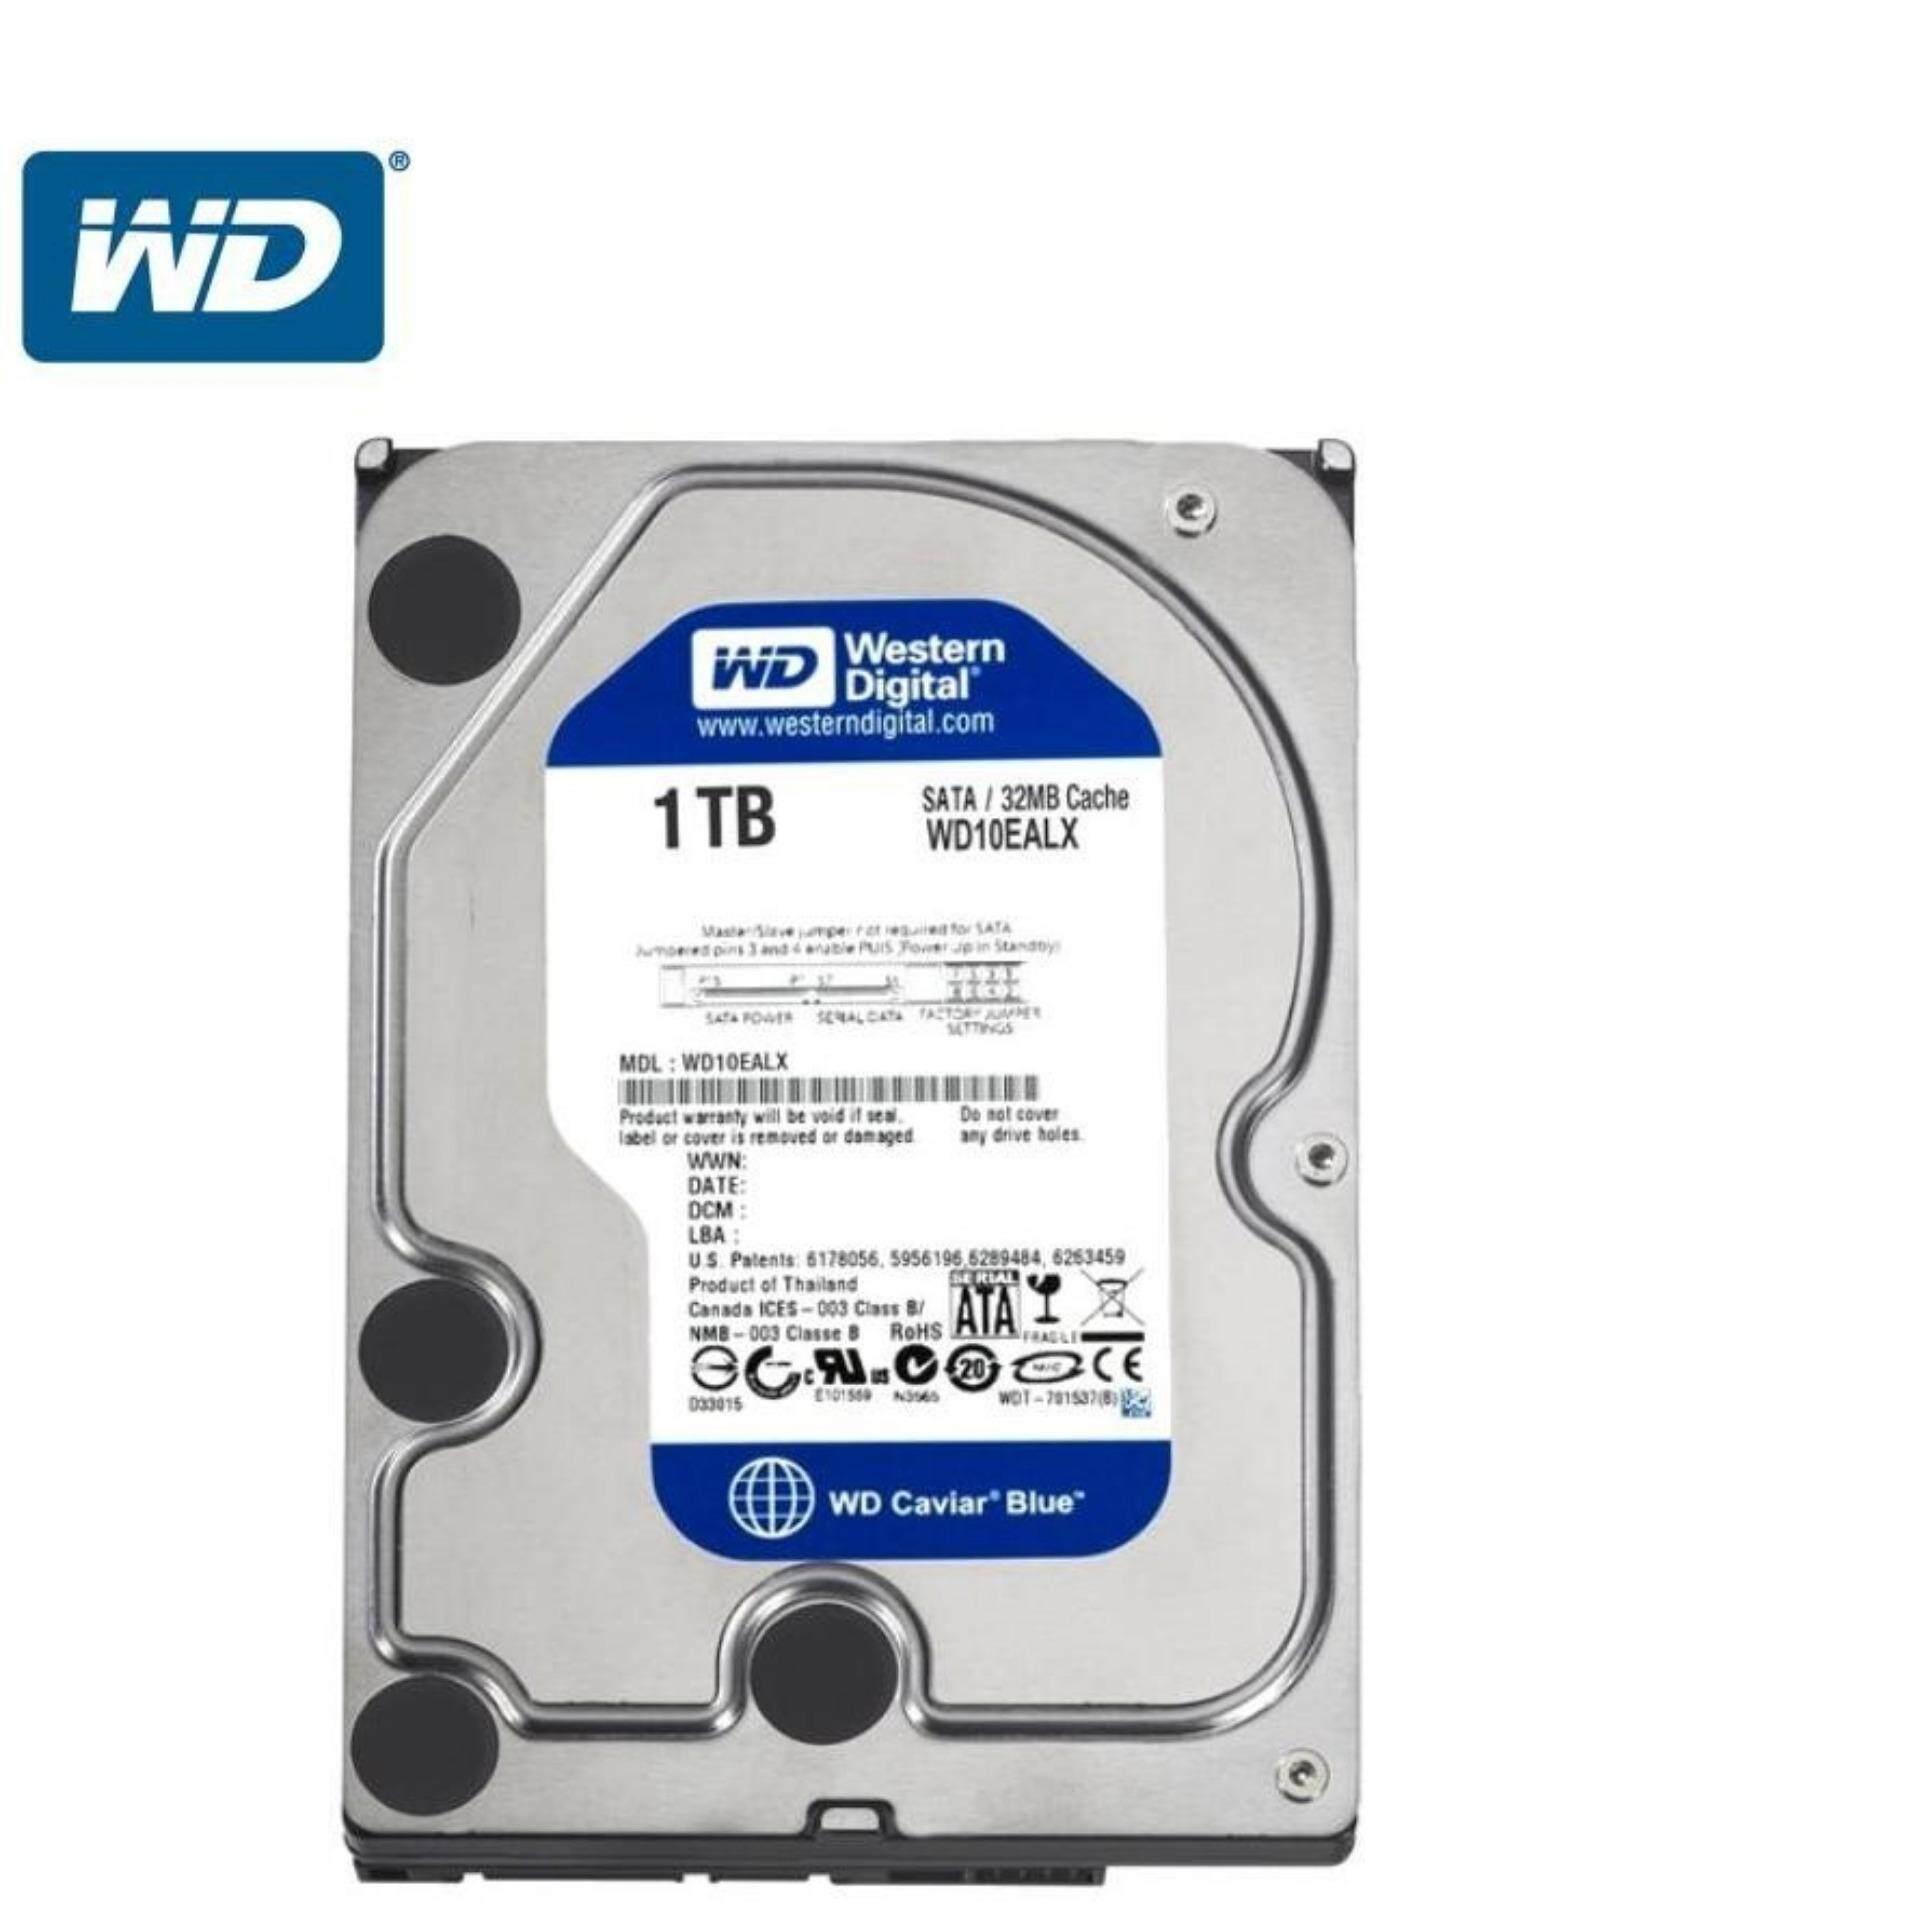 Wd Blue 1 Tb 7200 Rpm Chace 64mb Hdd Internal Pc 35 Biru Review 6tb Sata Harddisk 35inch Free Antivirus Kaspersky Pen Western Digital 1tb Desktop Hard Disk Drive